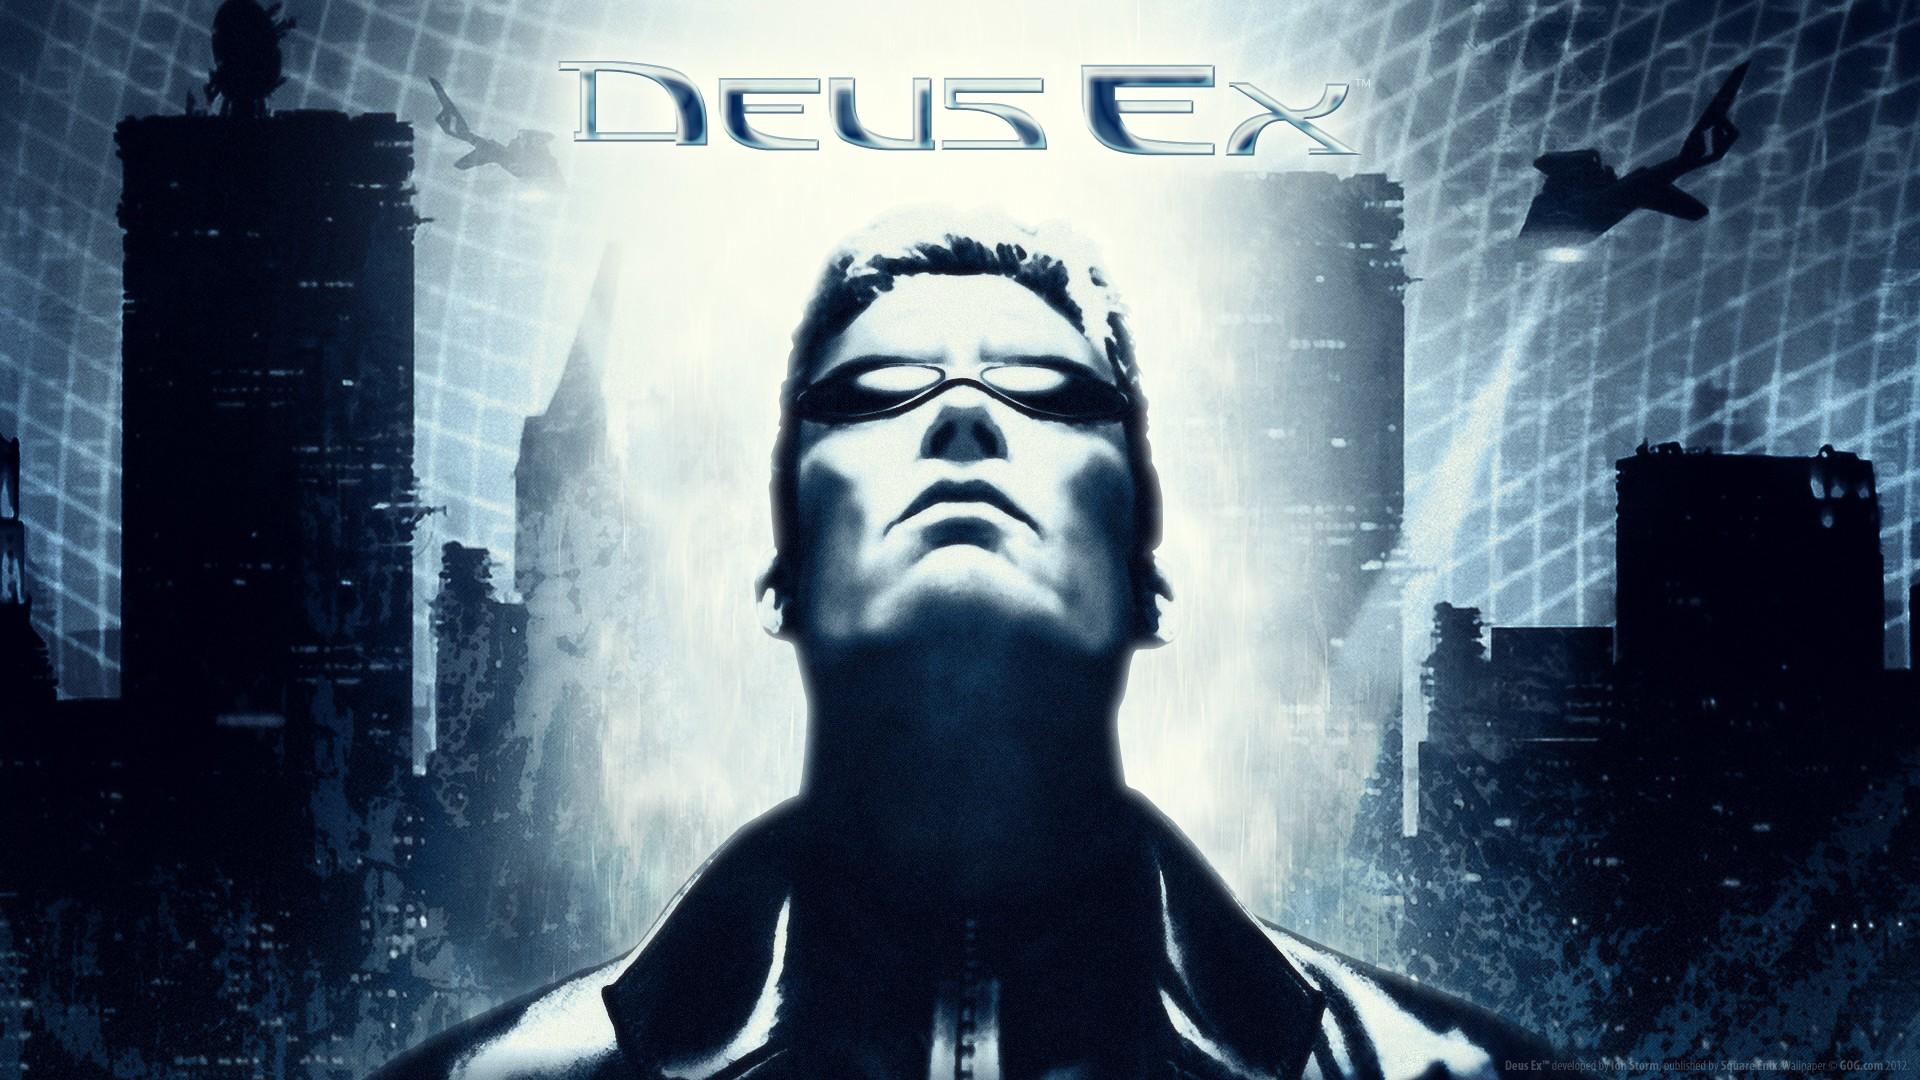 Deus Ex JC Denton UNATCO